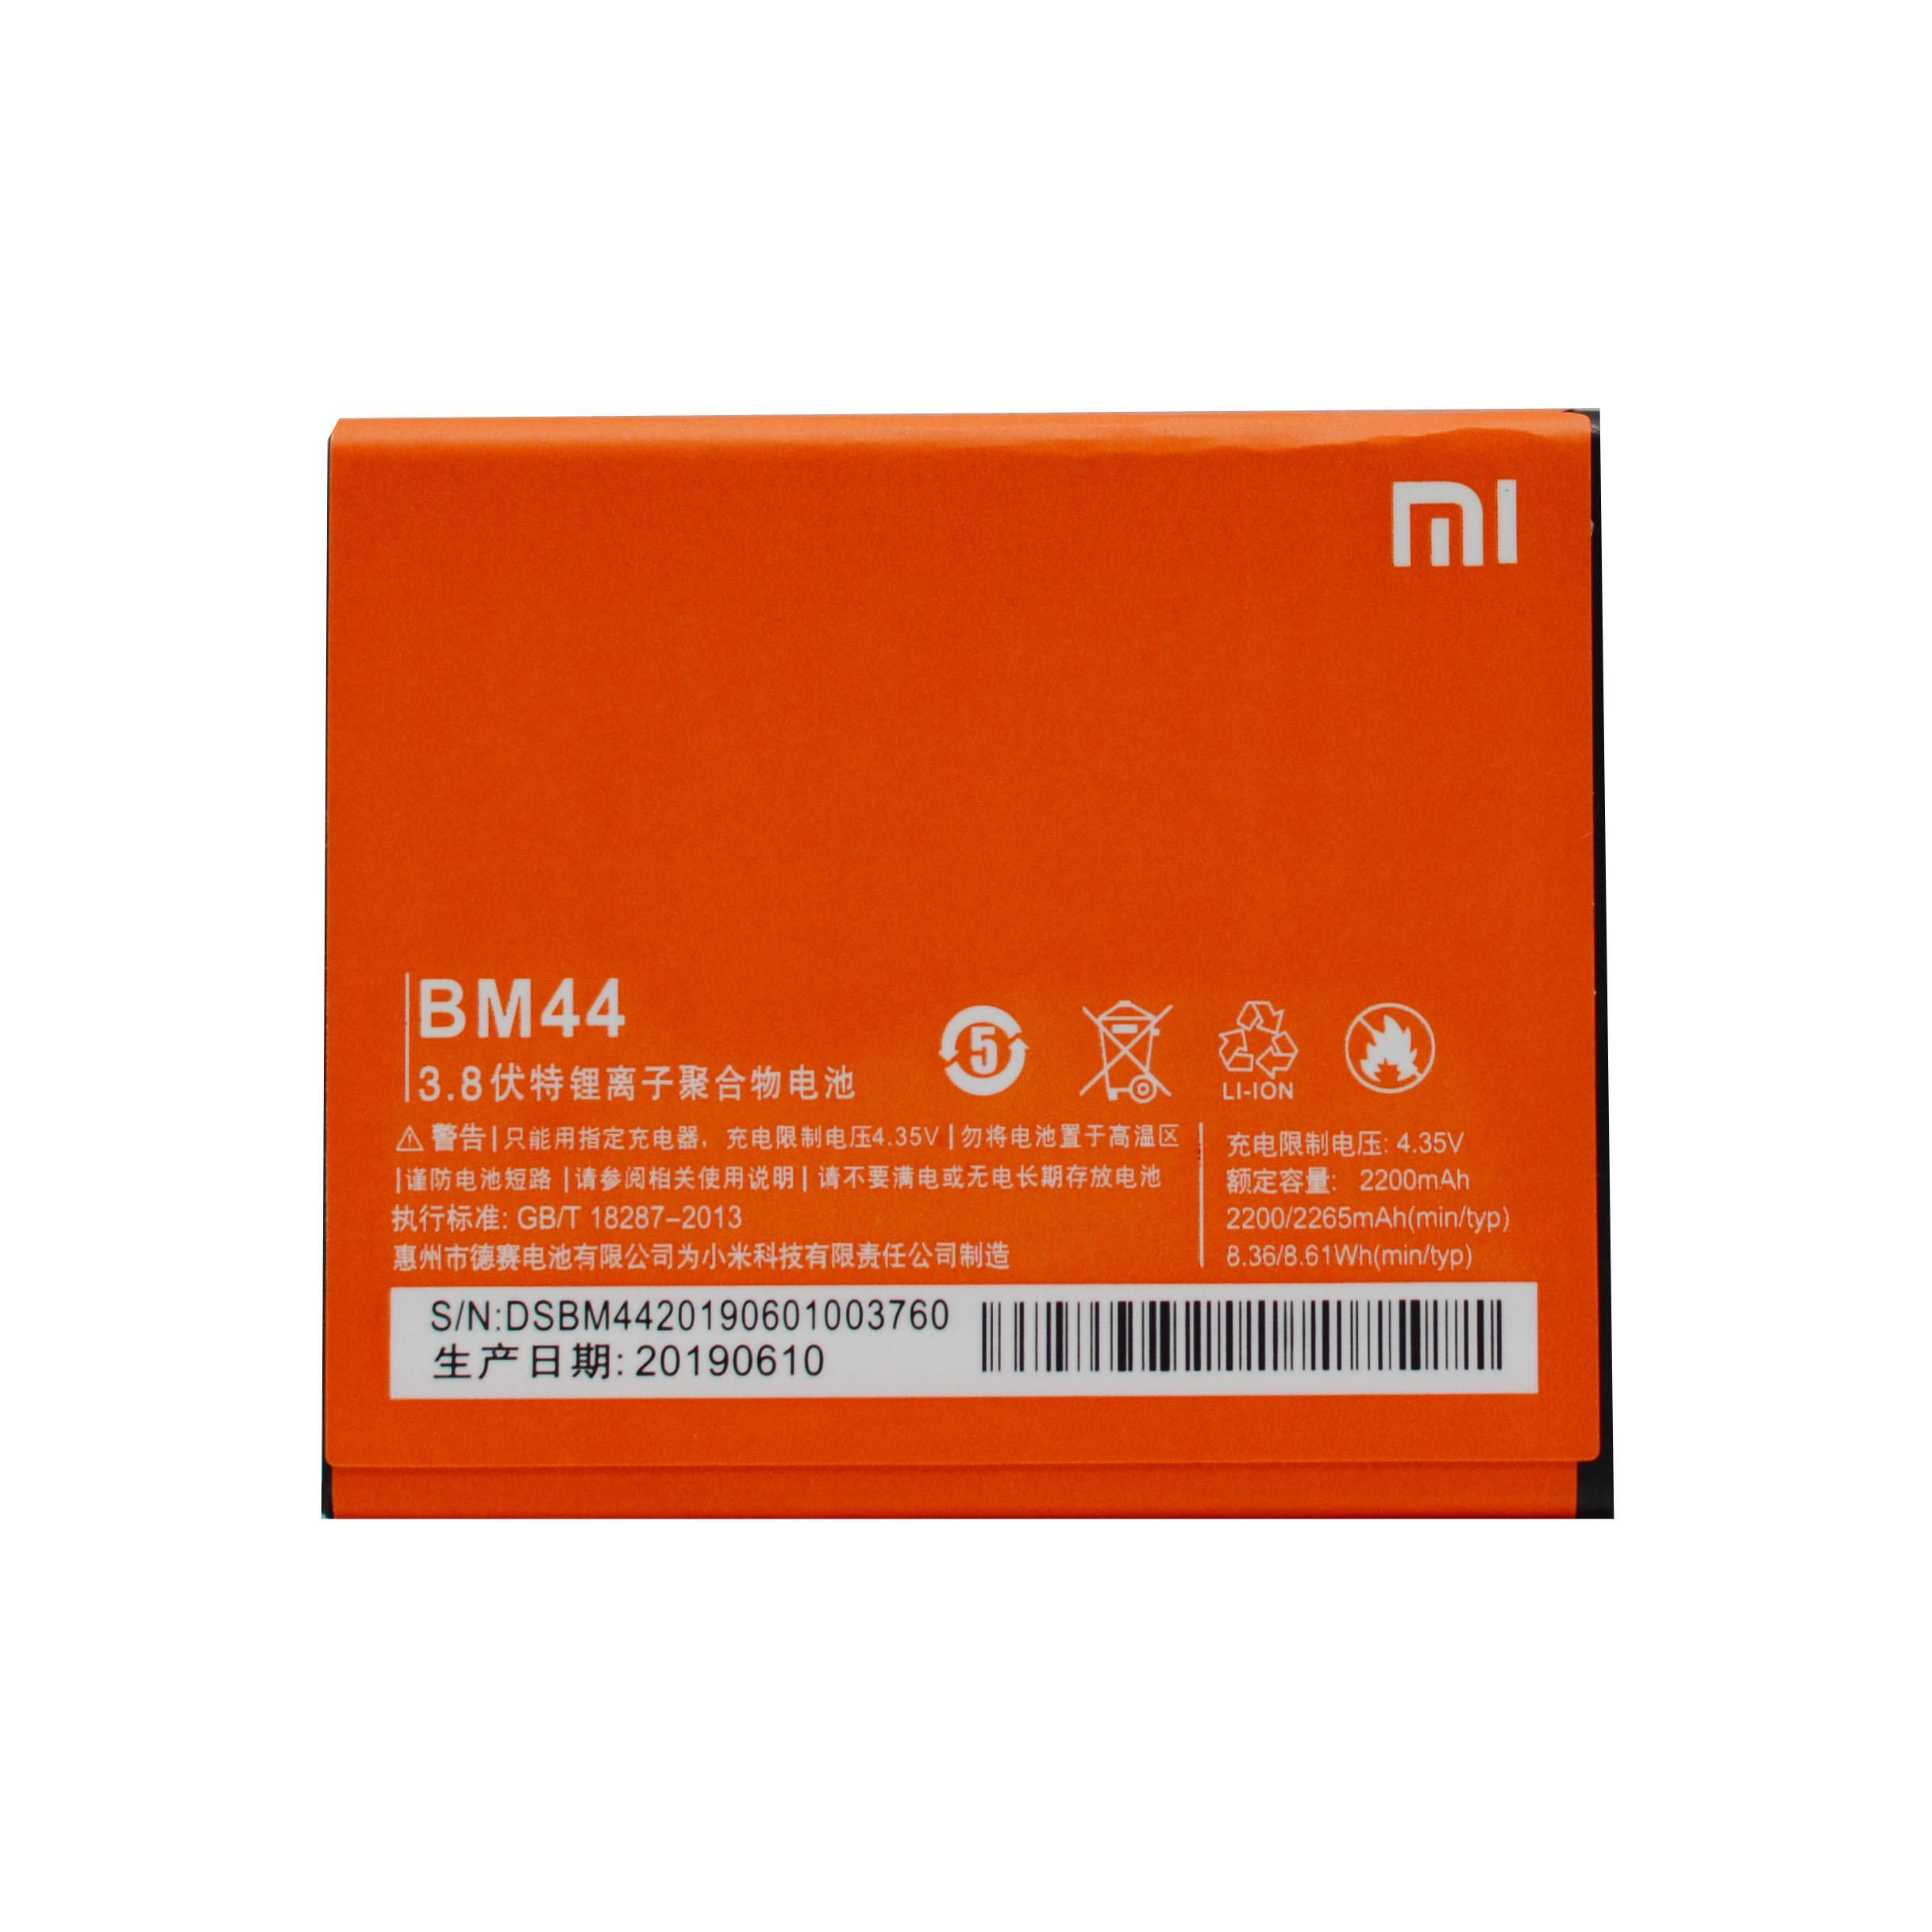 20pcs/lot Battery BM44 For Xiaomi Redmi 2 2A Hongmi2 bm44 2200mAh Capacity Original Rechargeable Smart Phone Batteries enlarge